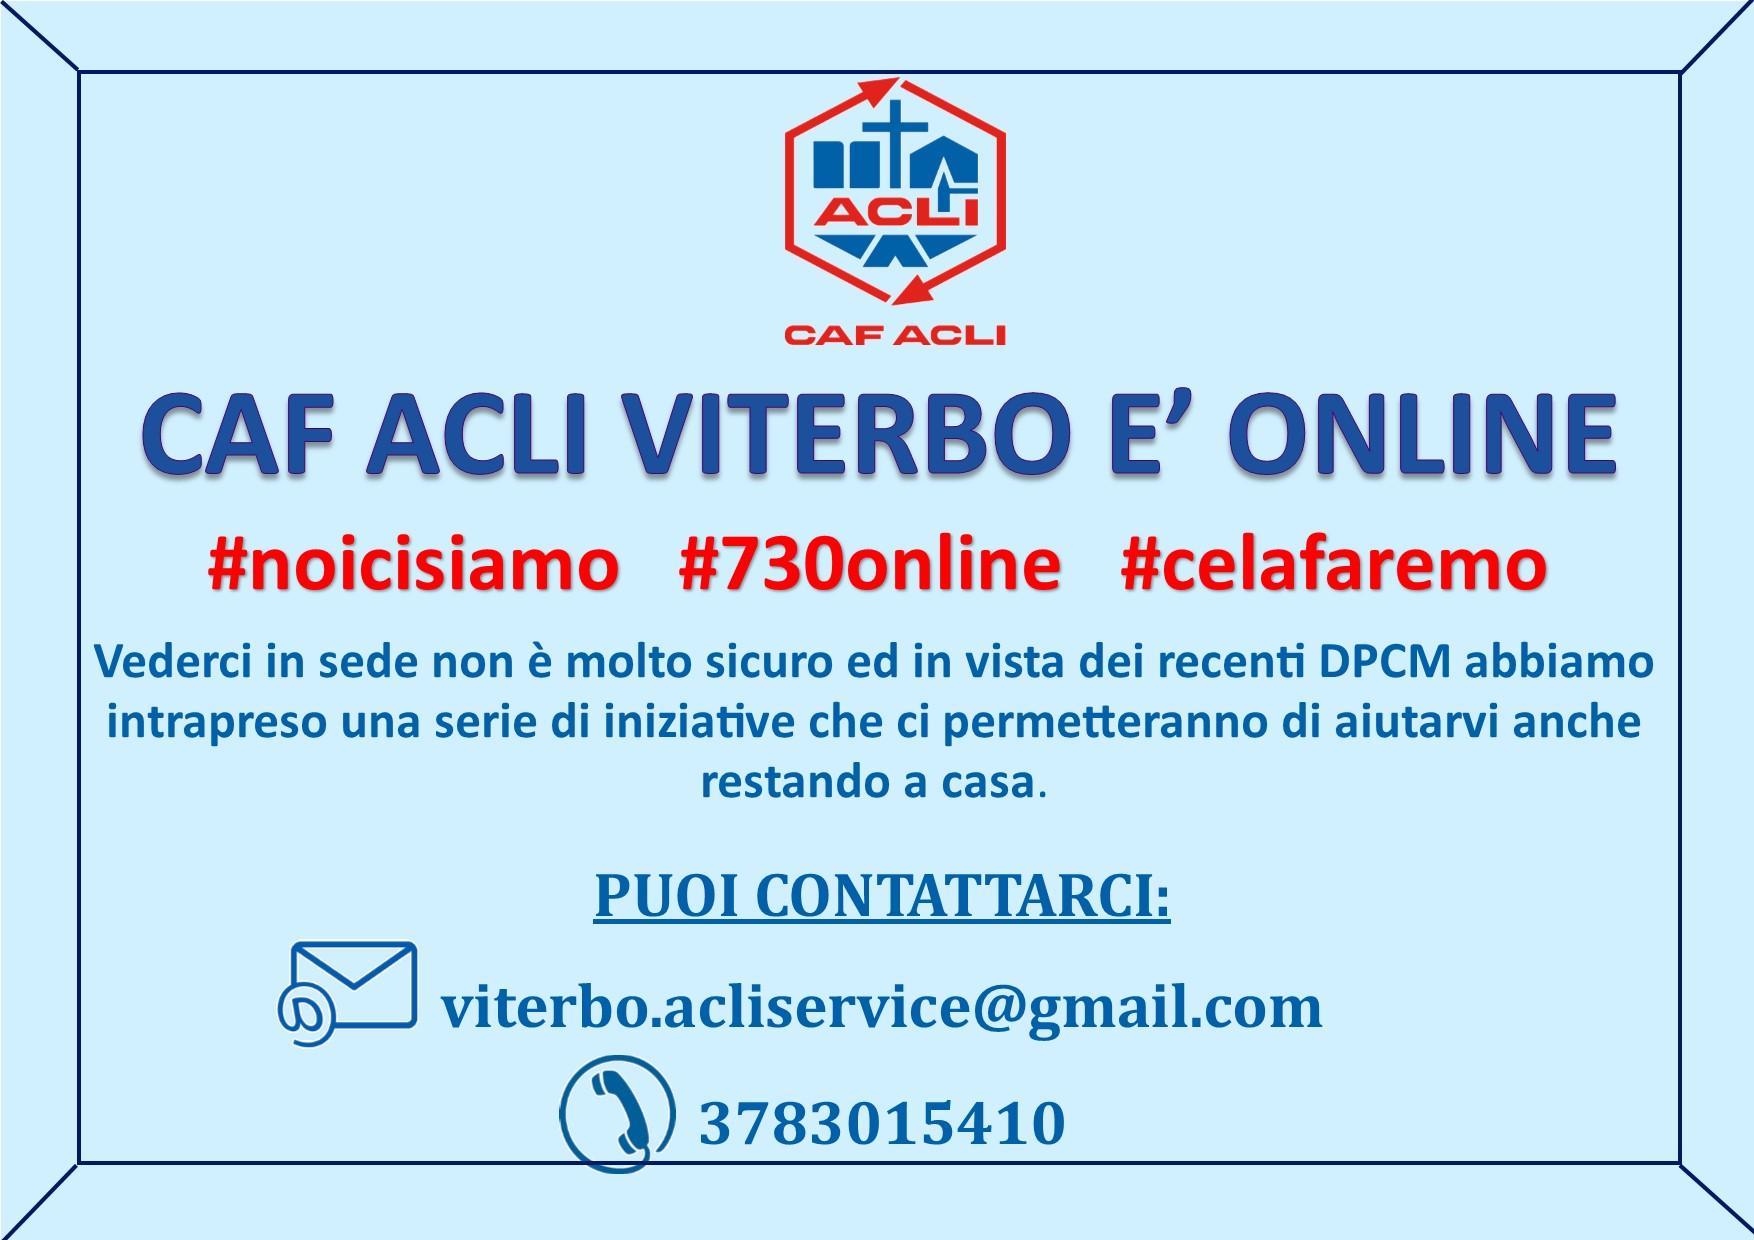 Caf Acli Viterbo online 1